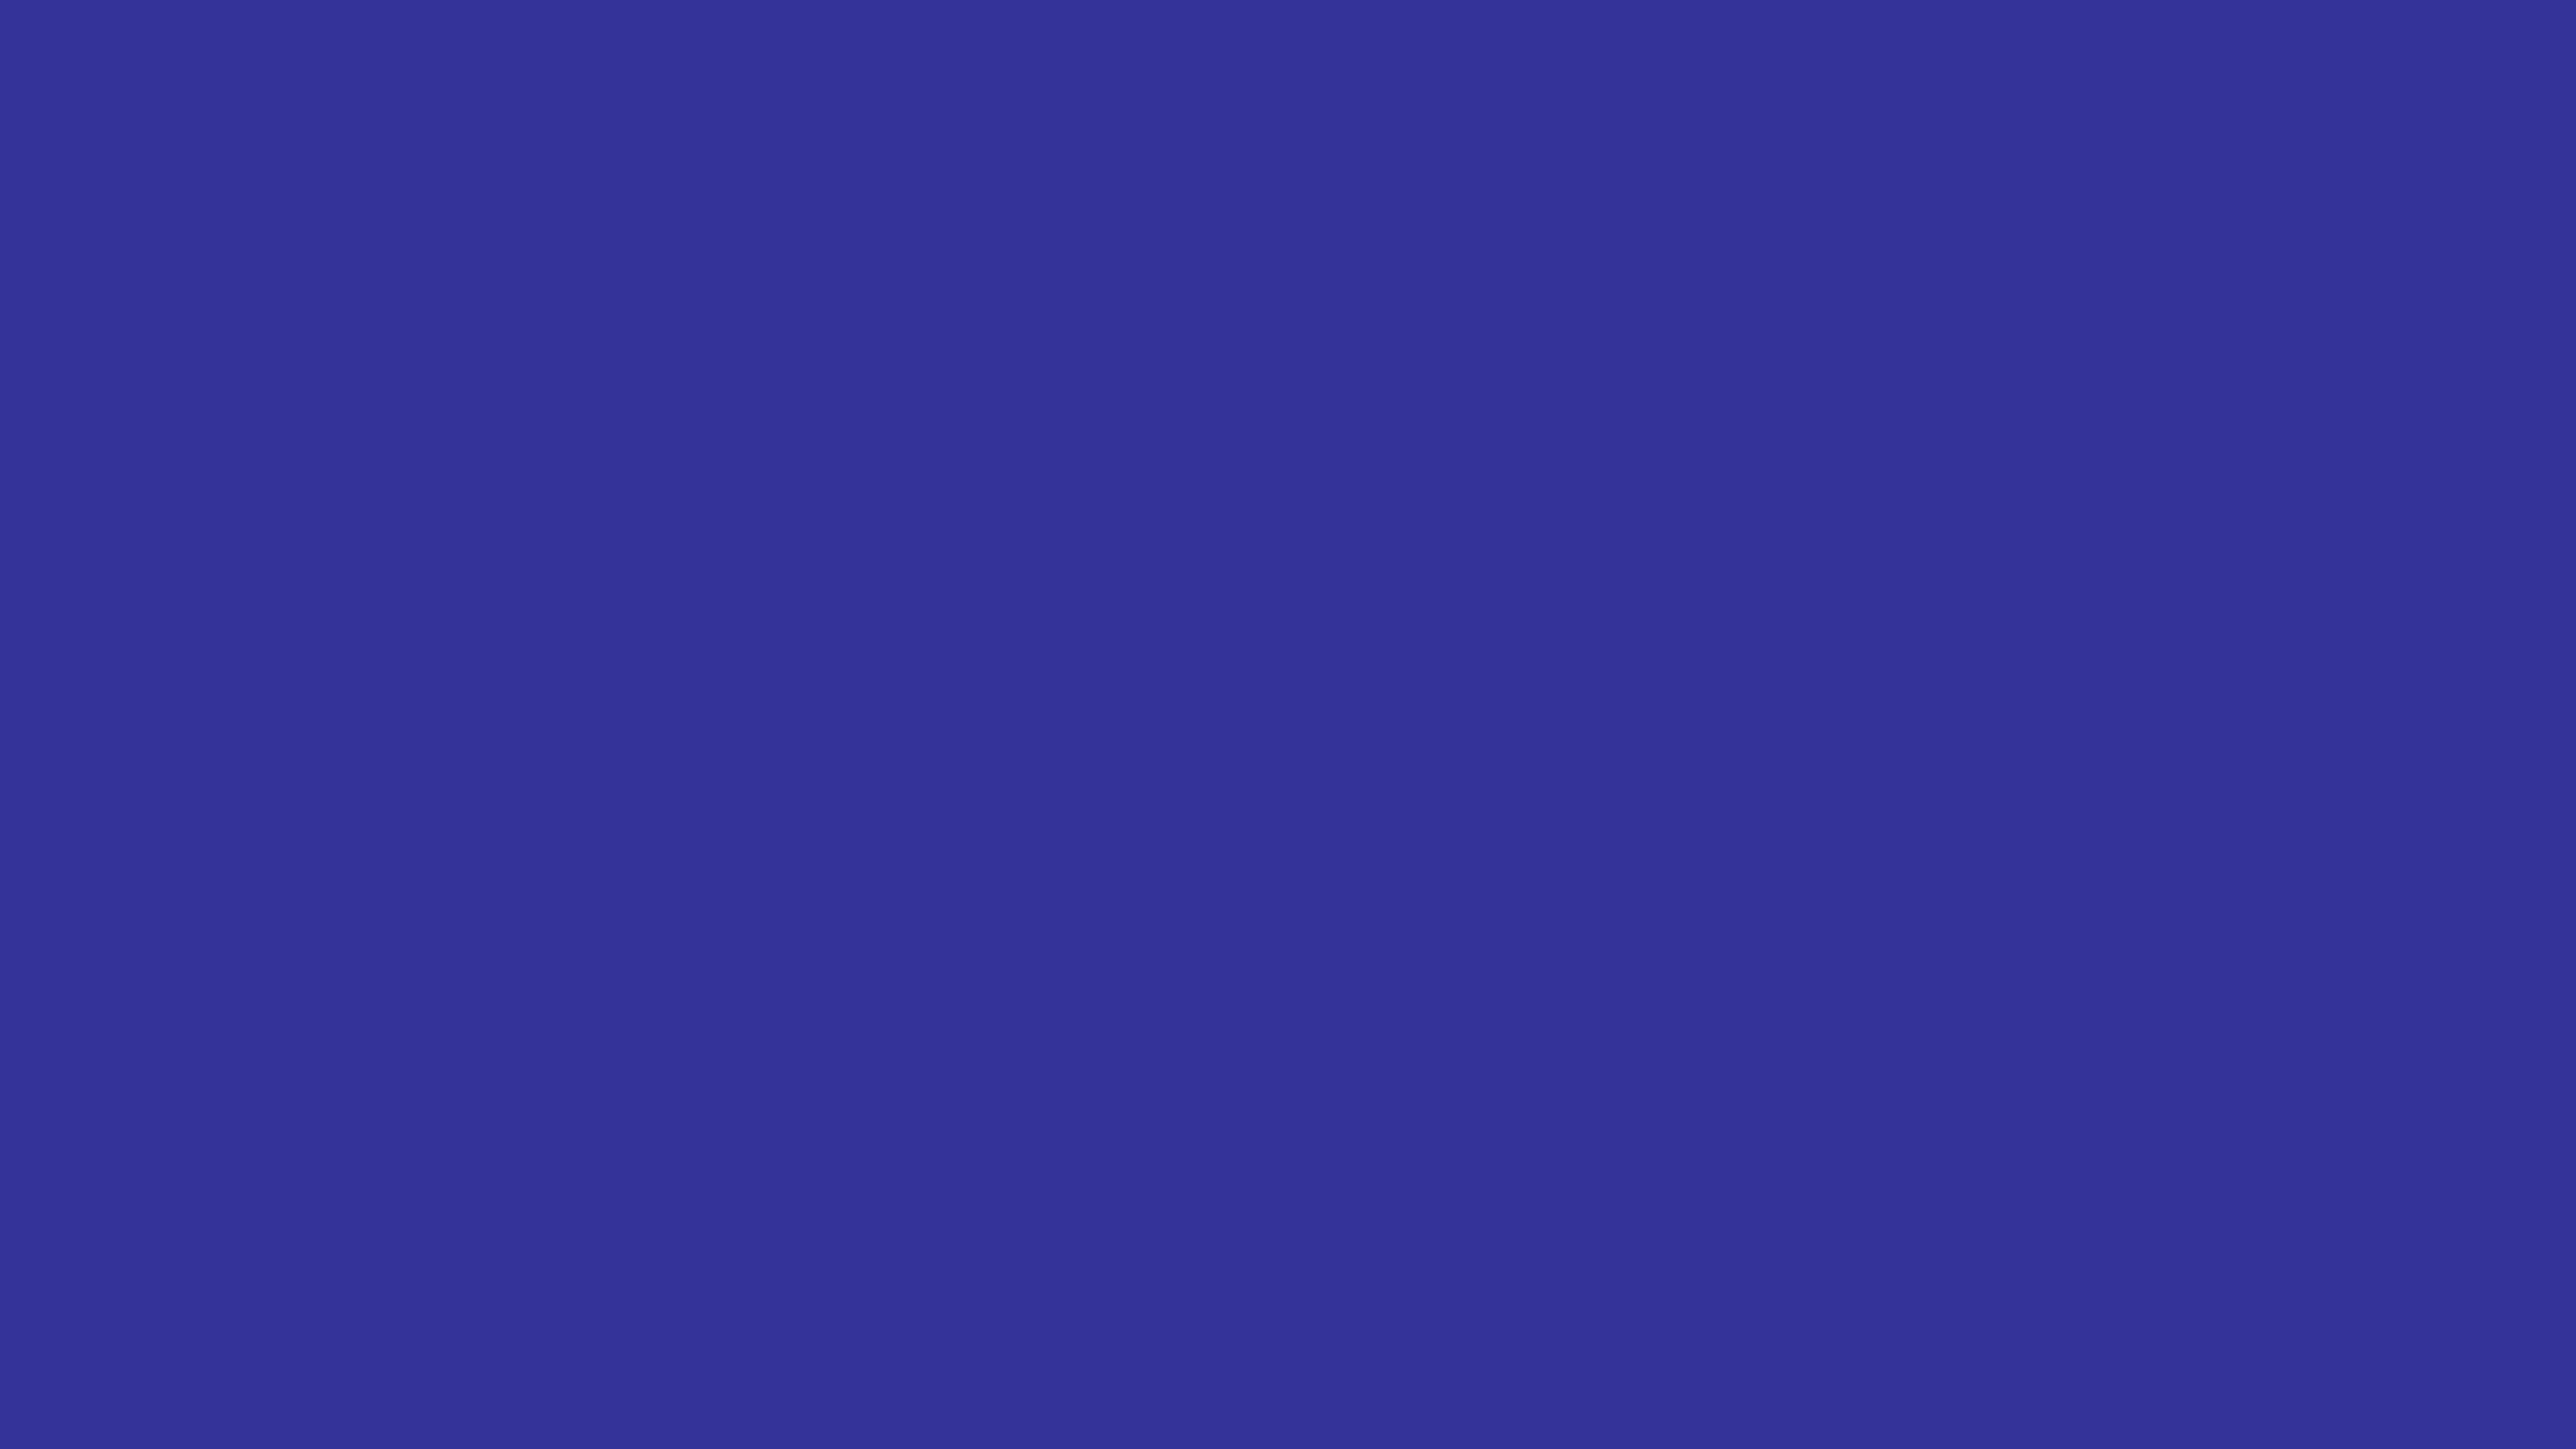 5120x2880 Blue Pigment Solid Color Background